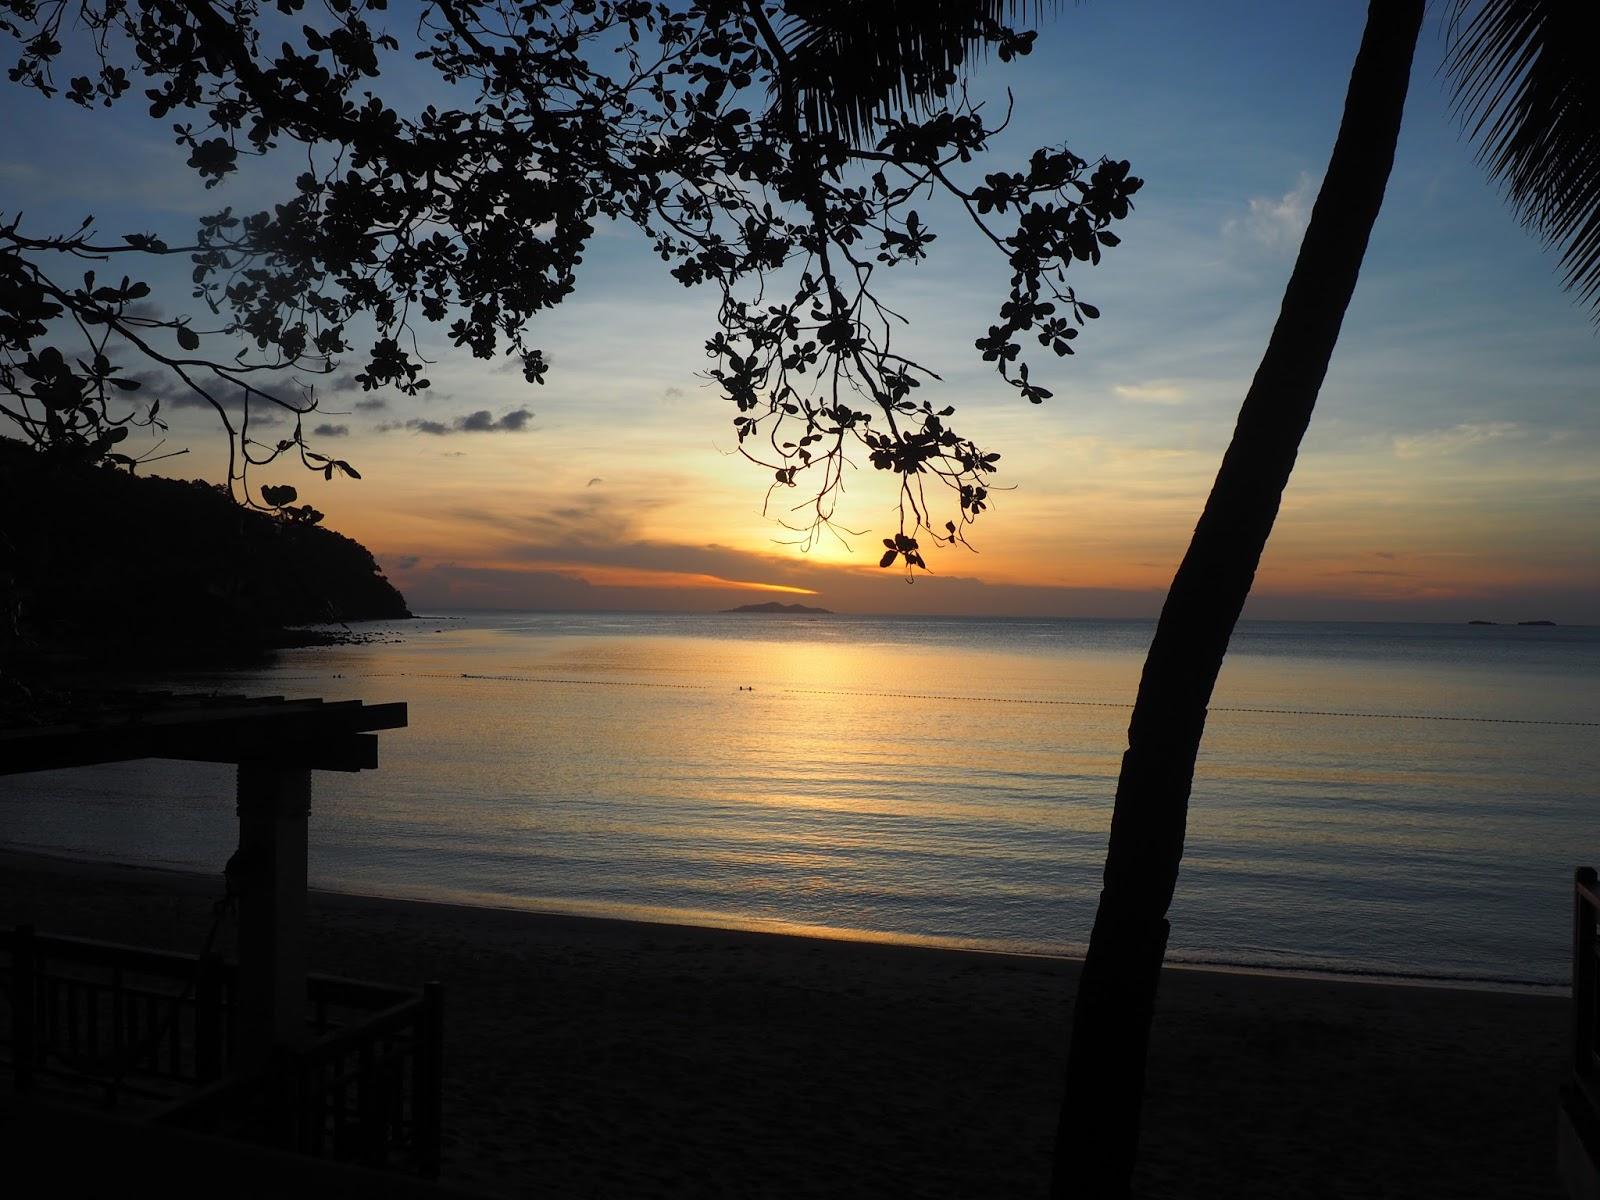 Vinatraveler S Blog Amazing Day Trip At Terrazas De Punta